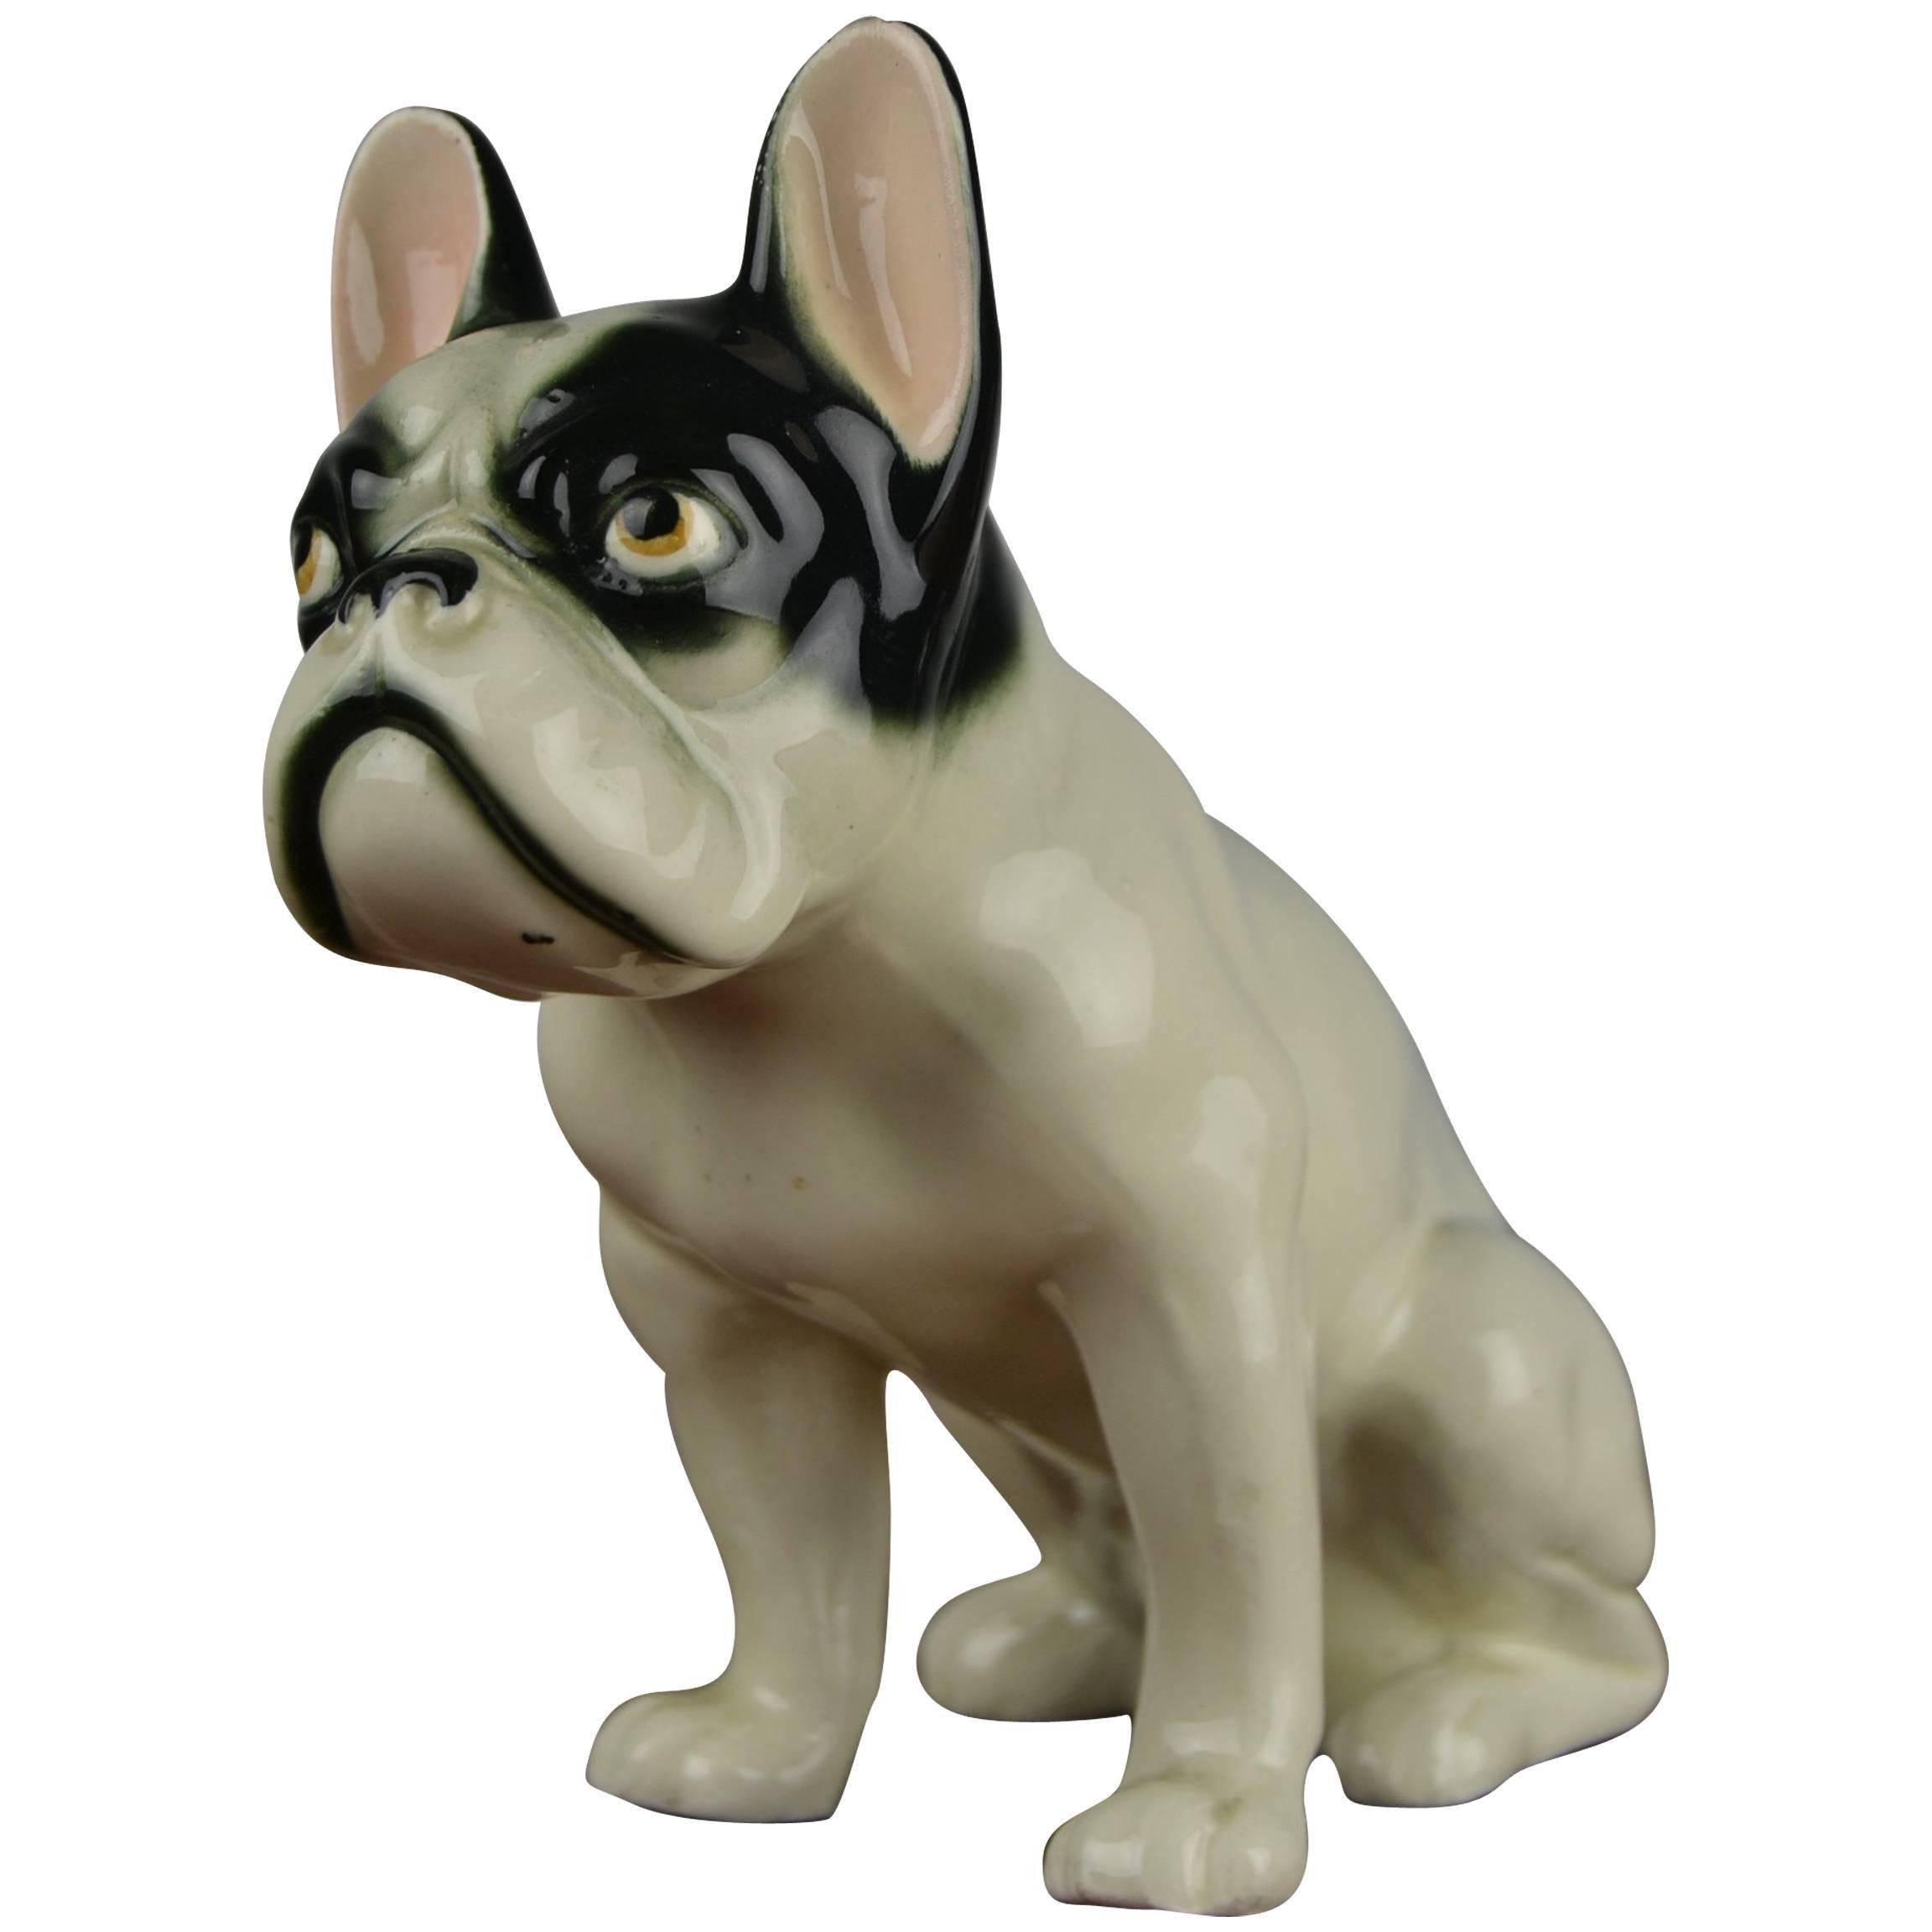 Antique Large Hand-painted Porcelain French Bulldog Statue Figurine Animals Decorative Arts